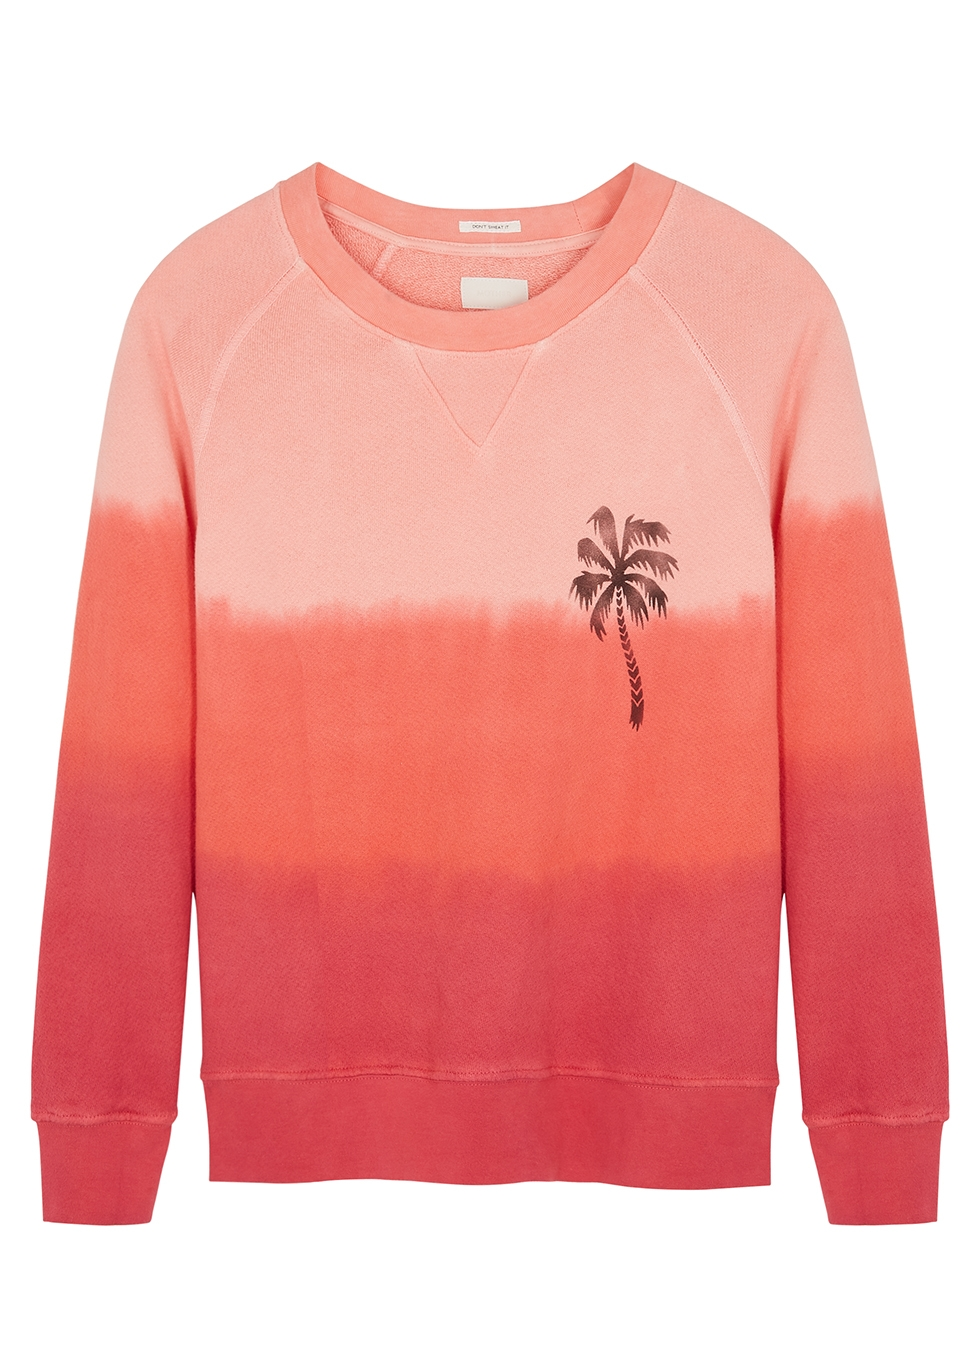 f28c0486de7 Women's Designer Knitwear and Jumpers - Harvey Nichols